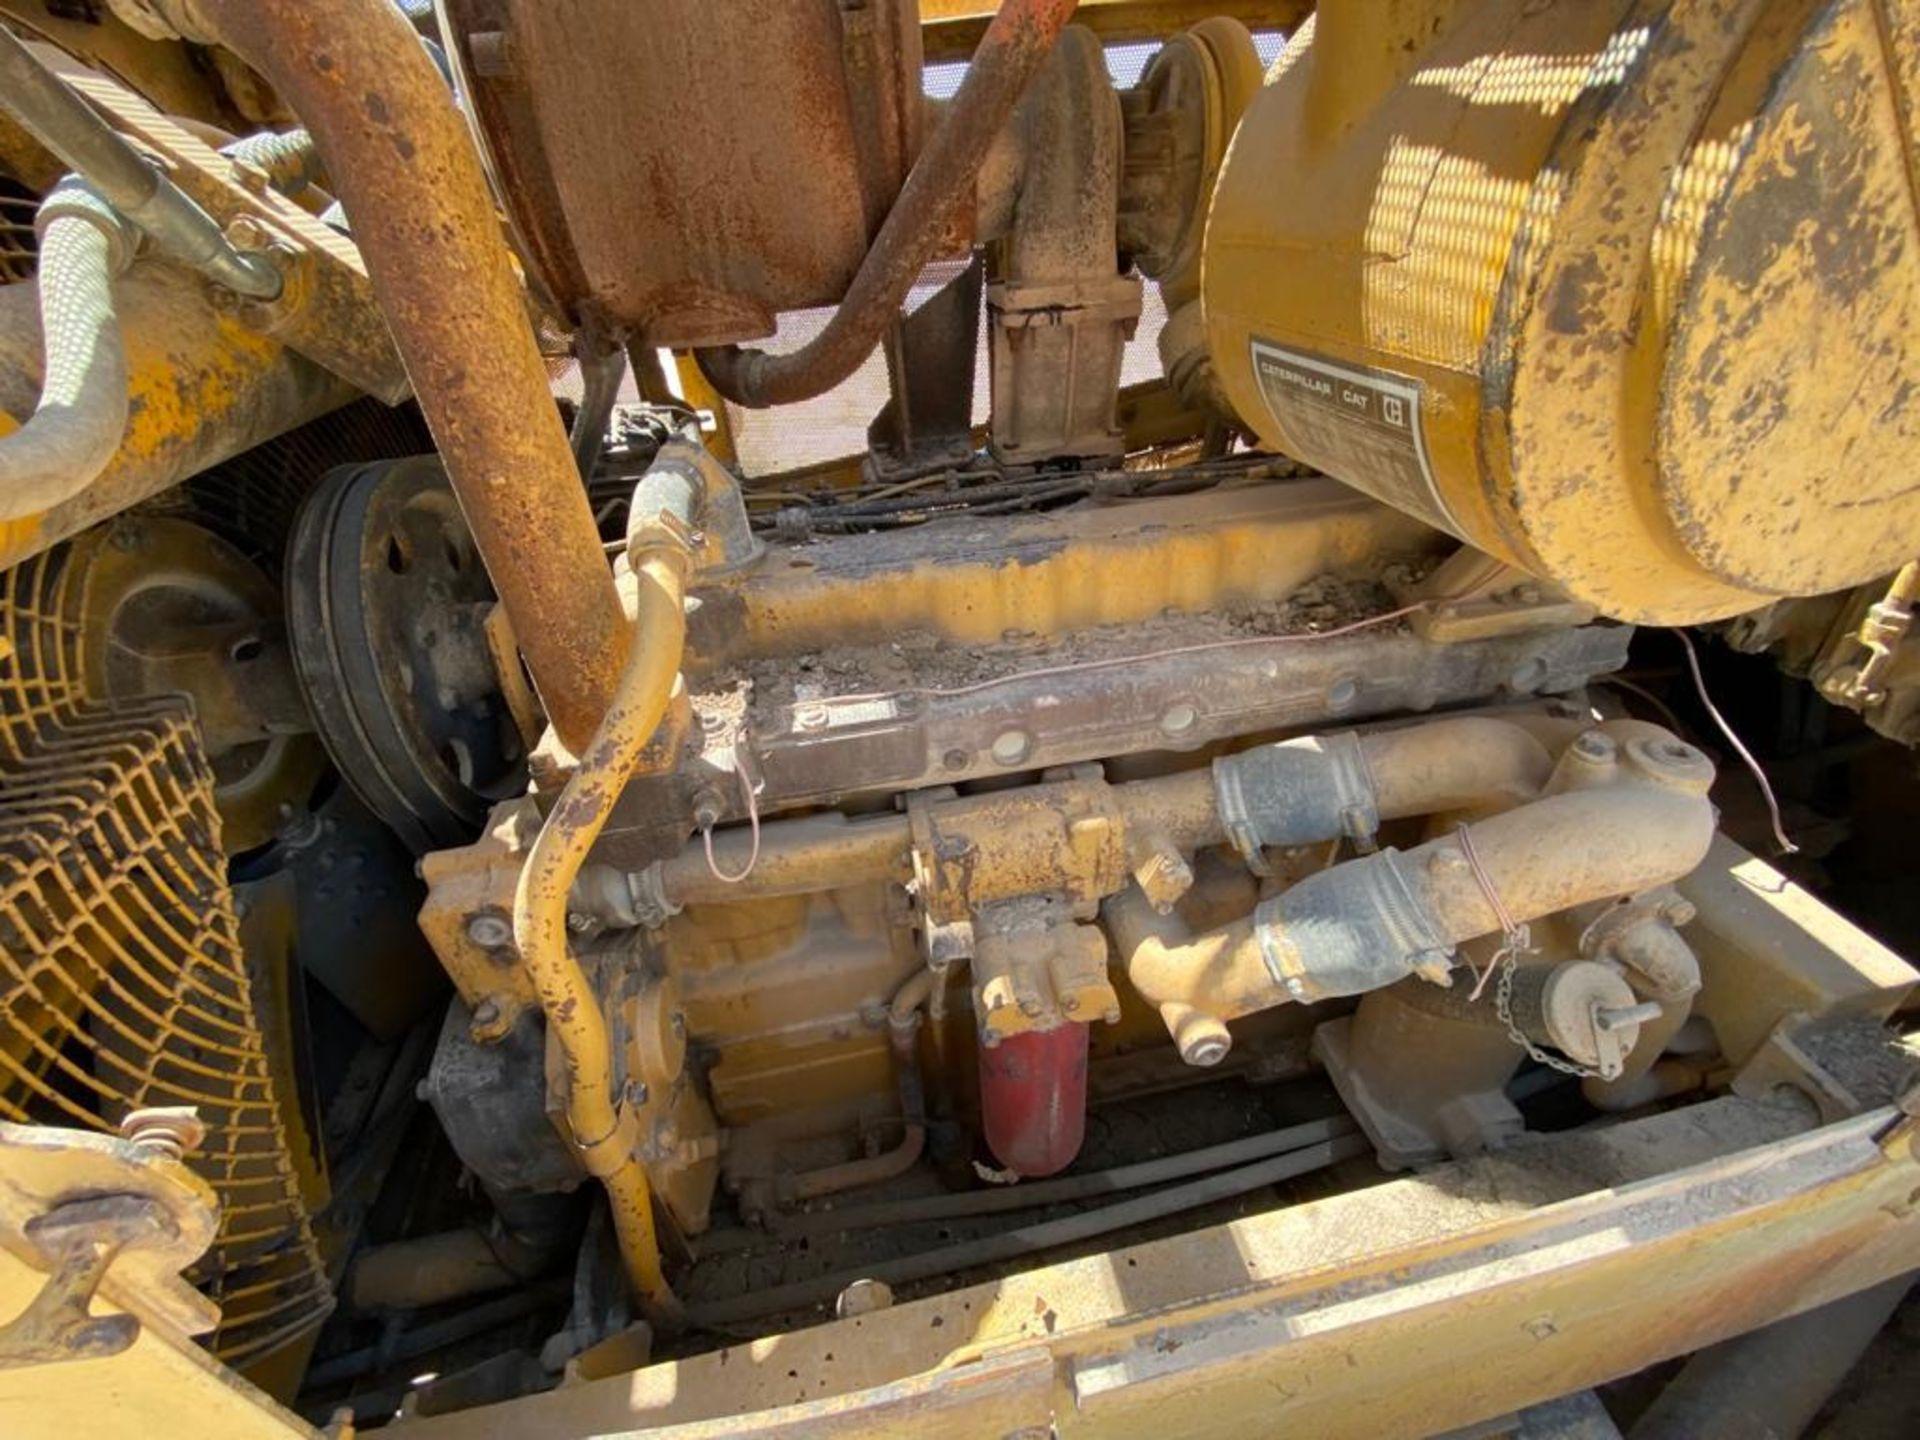 Caterpillar D7G Bulldozer, Serial number 92V5897, Diesel motor - Image 32 of 48